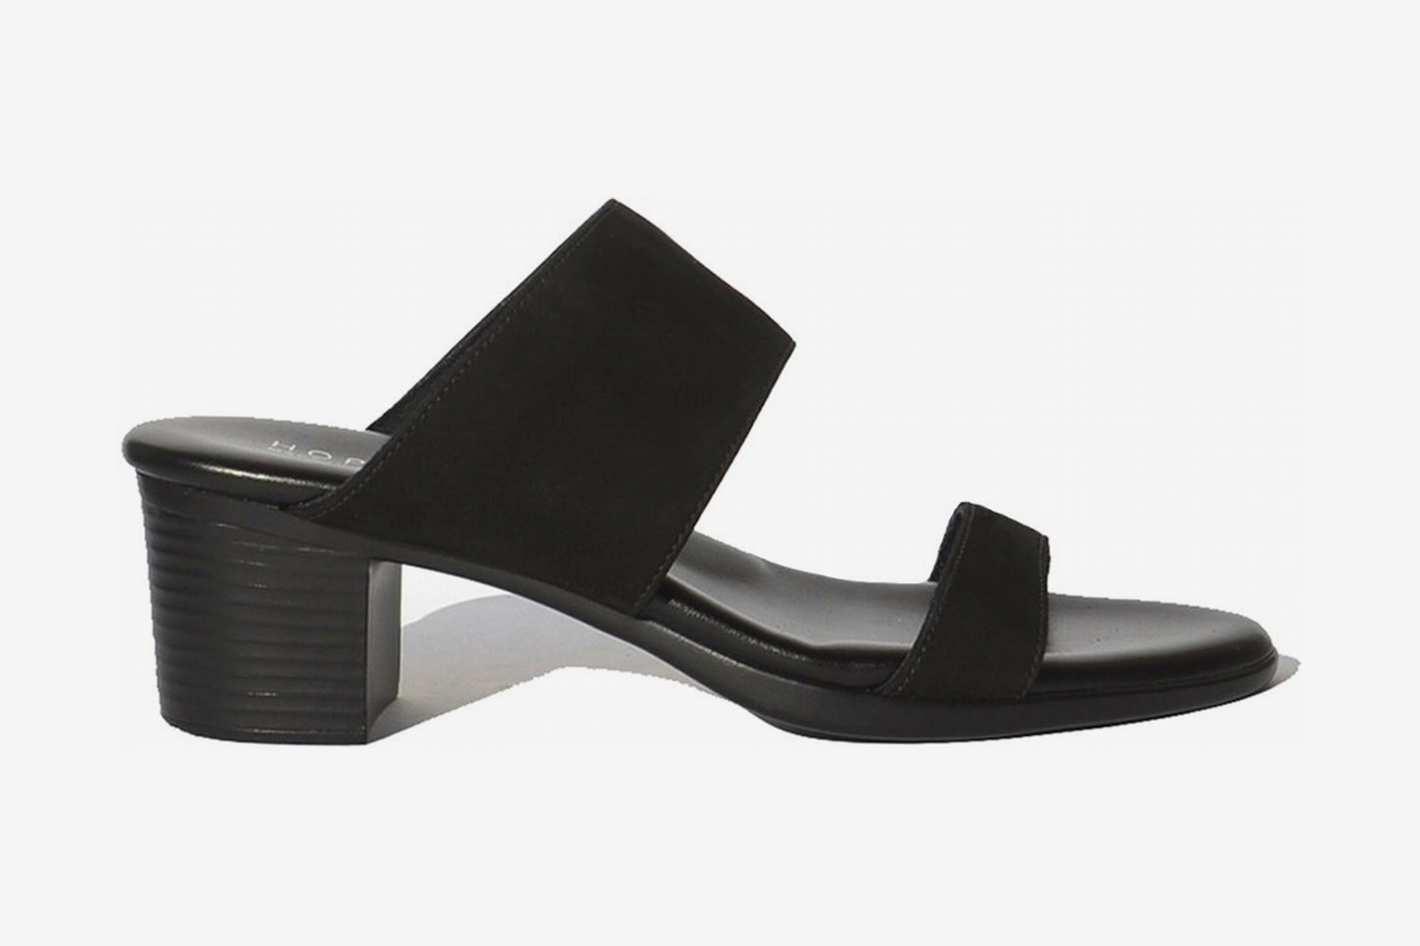 Hopp Two Strap Sandal - Black Nubuck